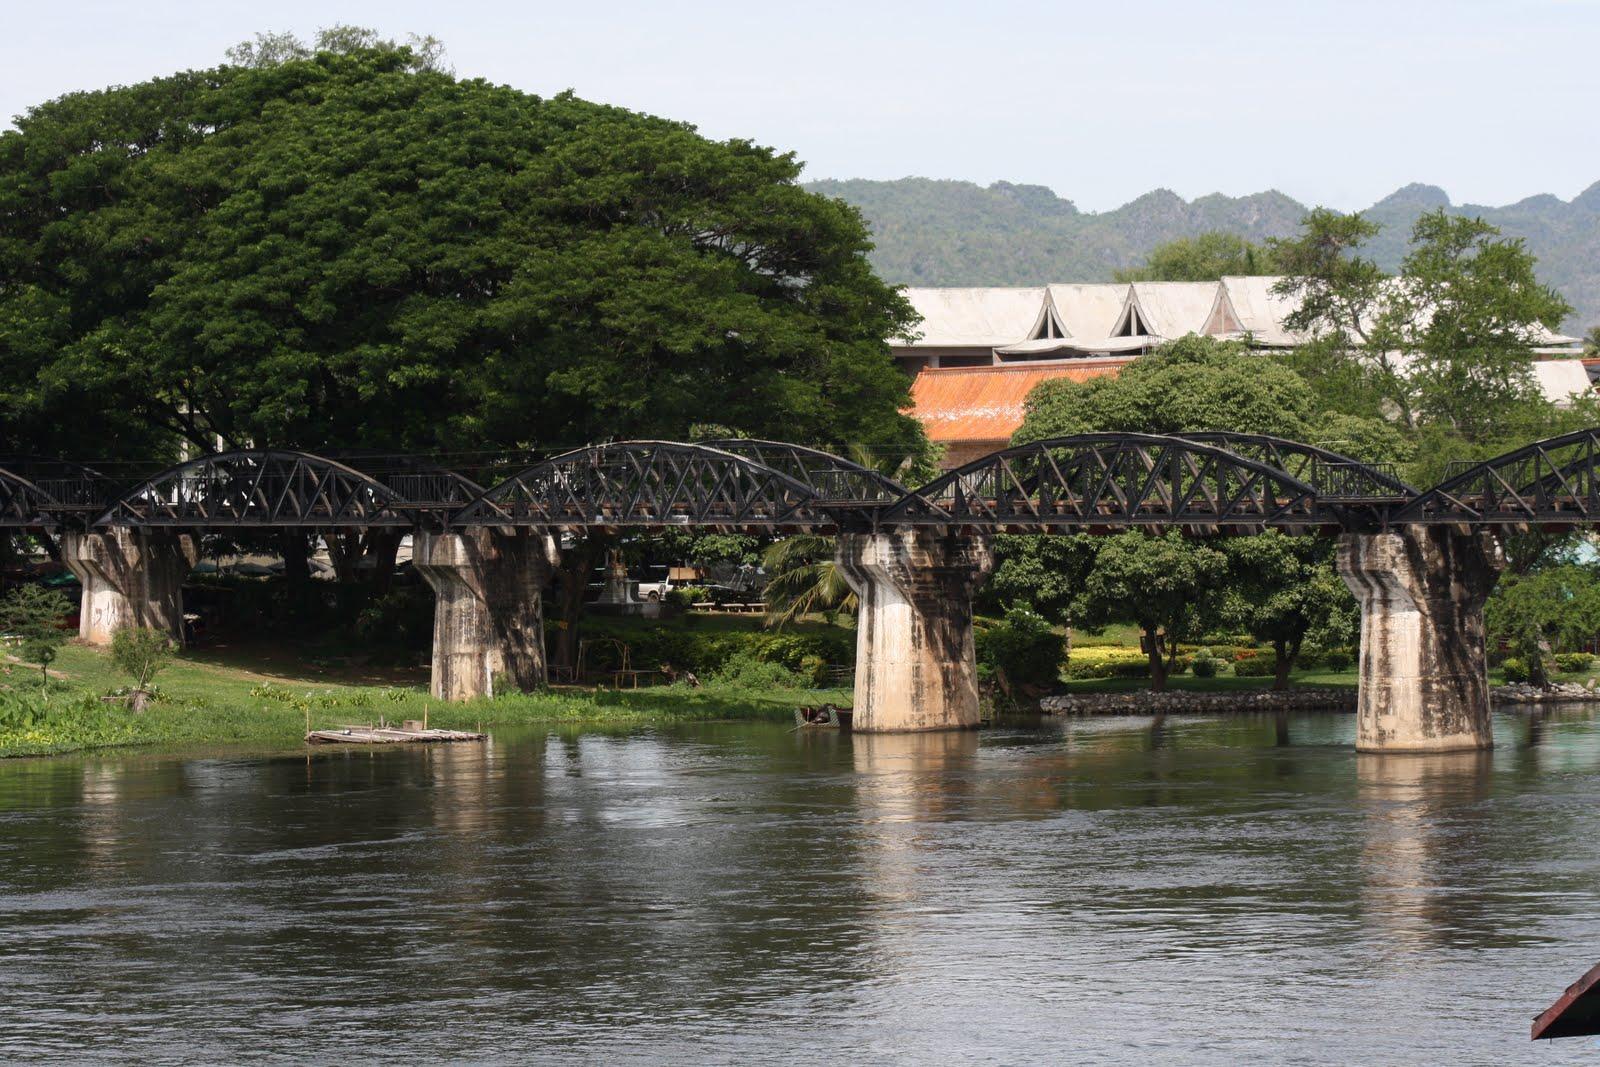 Phoebettmh Travel: (Thailand) - The Bridge On the River Kwai